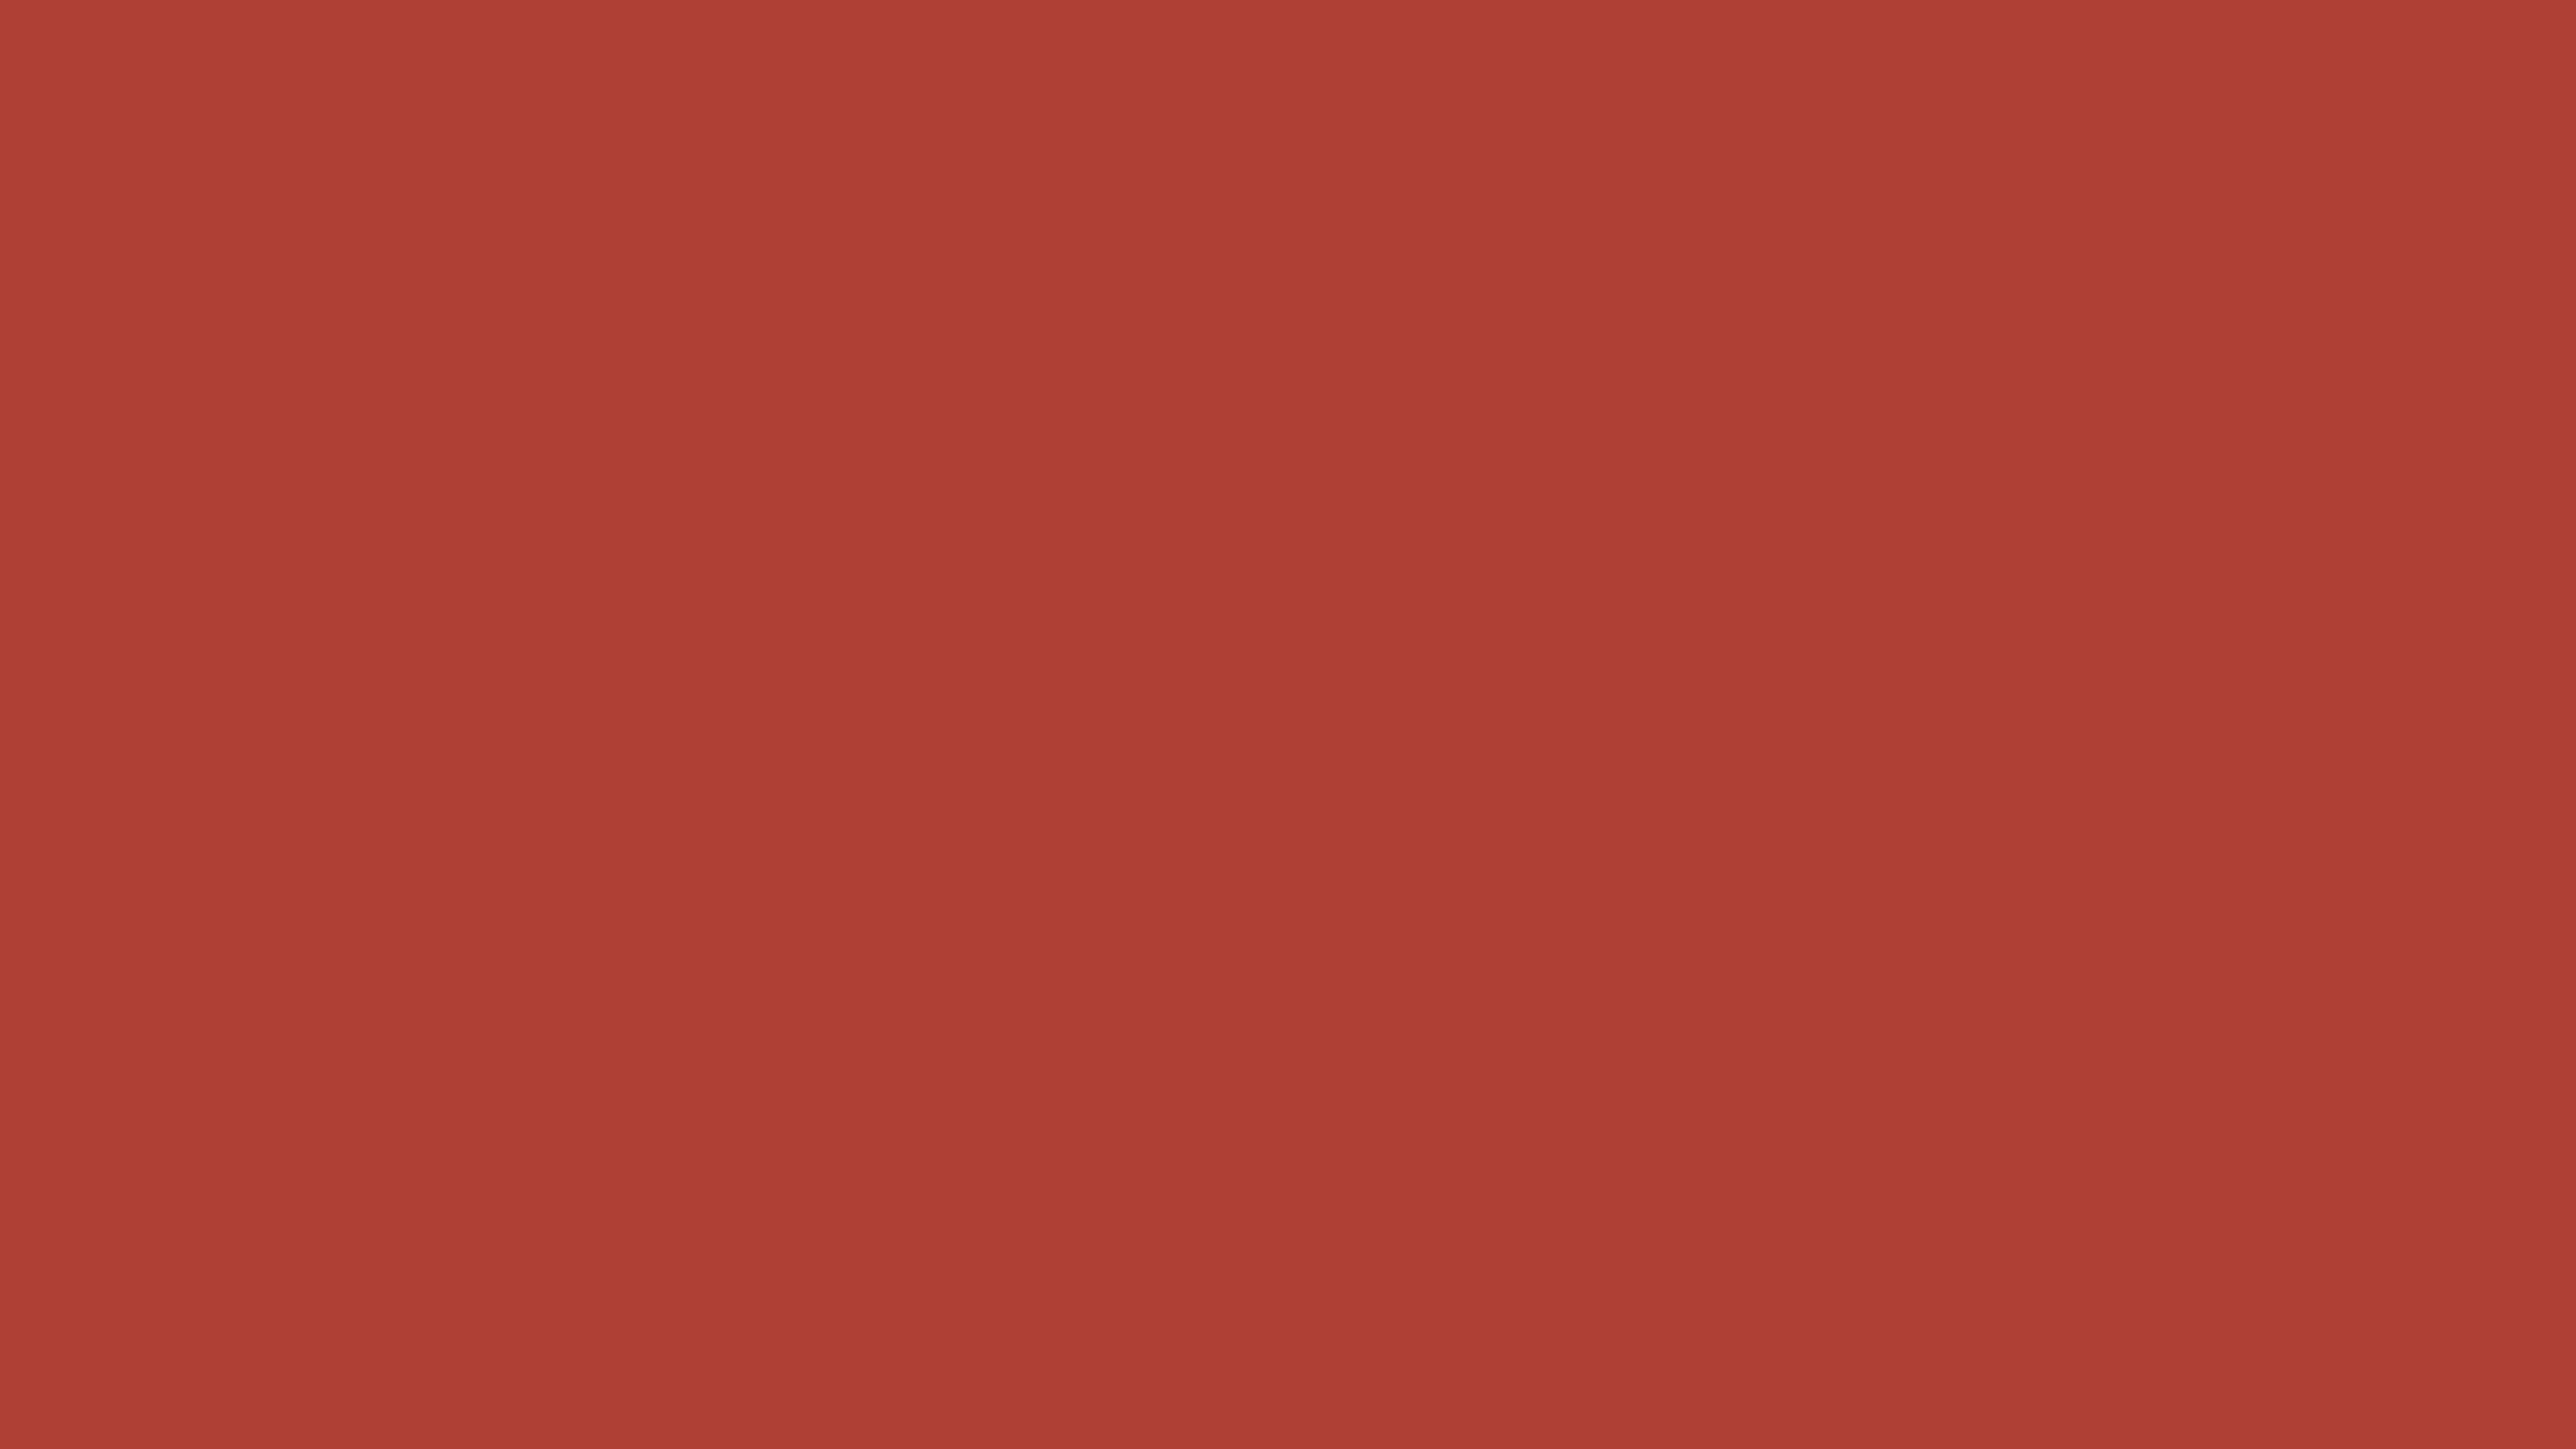 3840x2160 Medium Carmine Solid Color Background